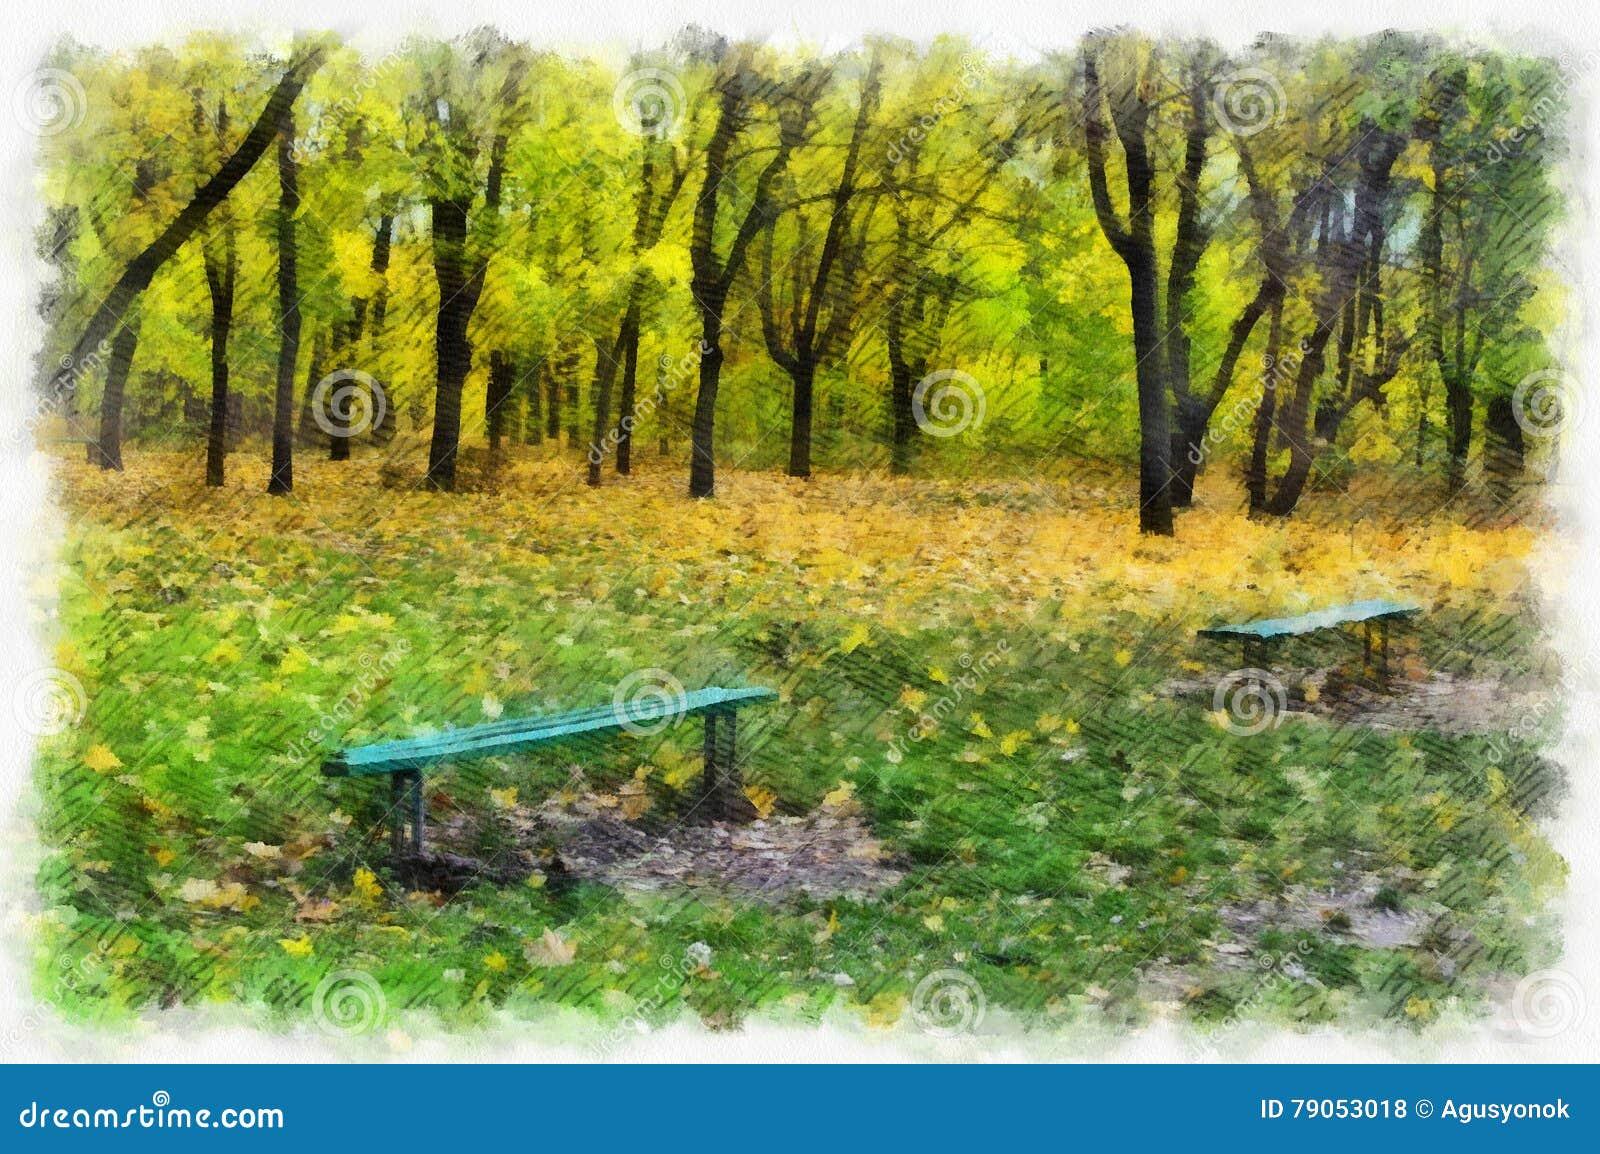 Autumn Background Beautiful Colorful Forest Landscape Nature Park ...